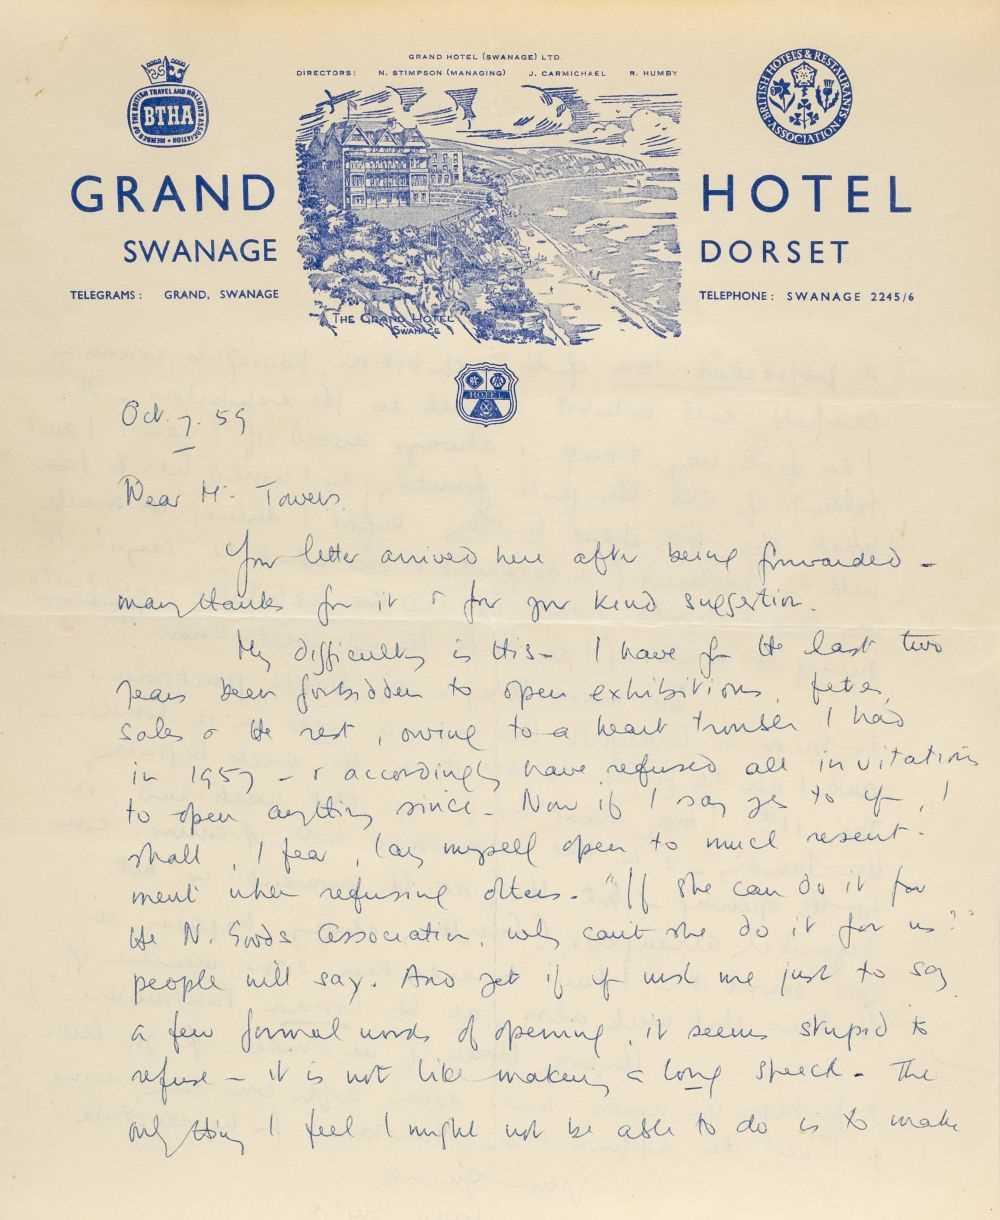 Lot 589 - Blyton (Enid, 1897-1968). Autograph letter signed, 7 October 1959